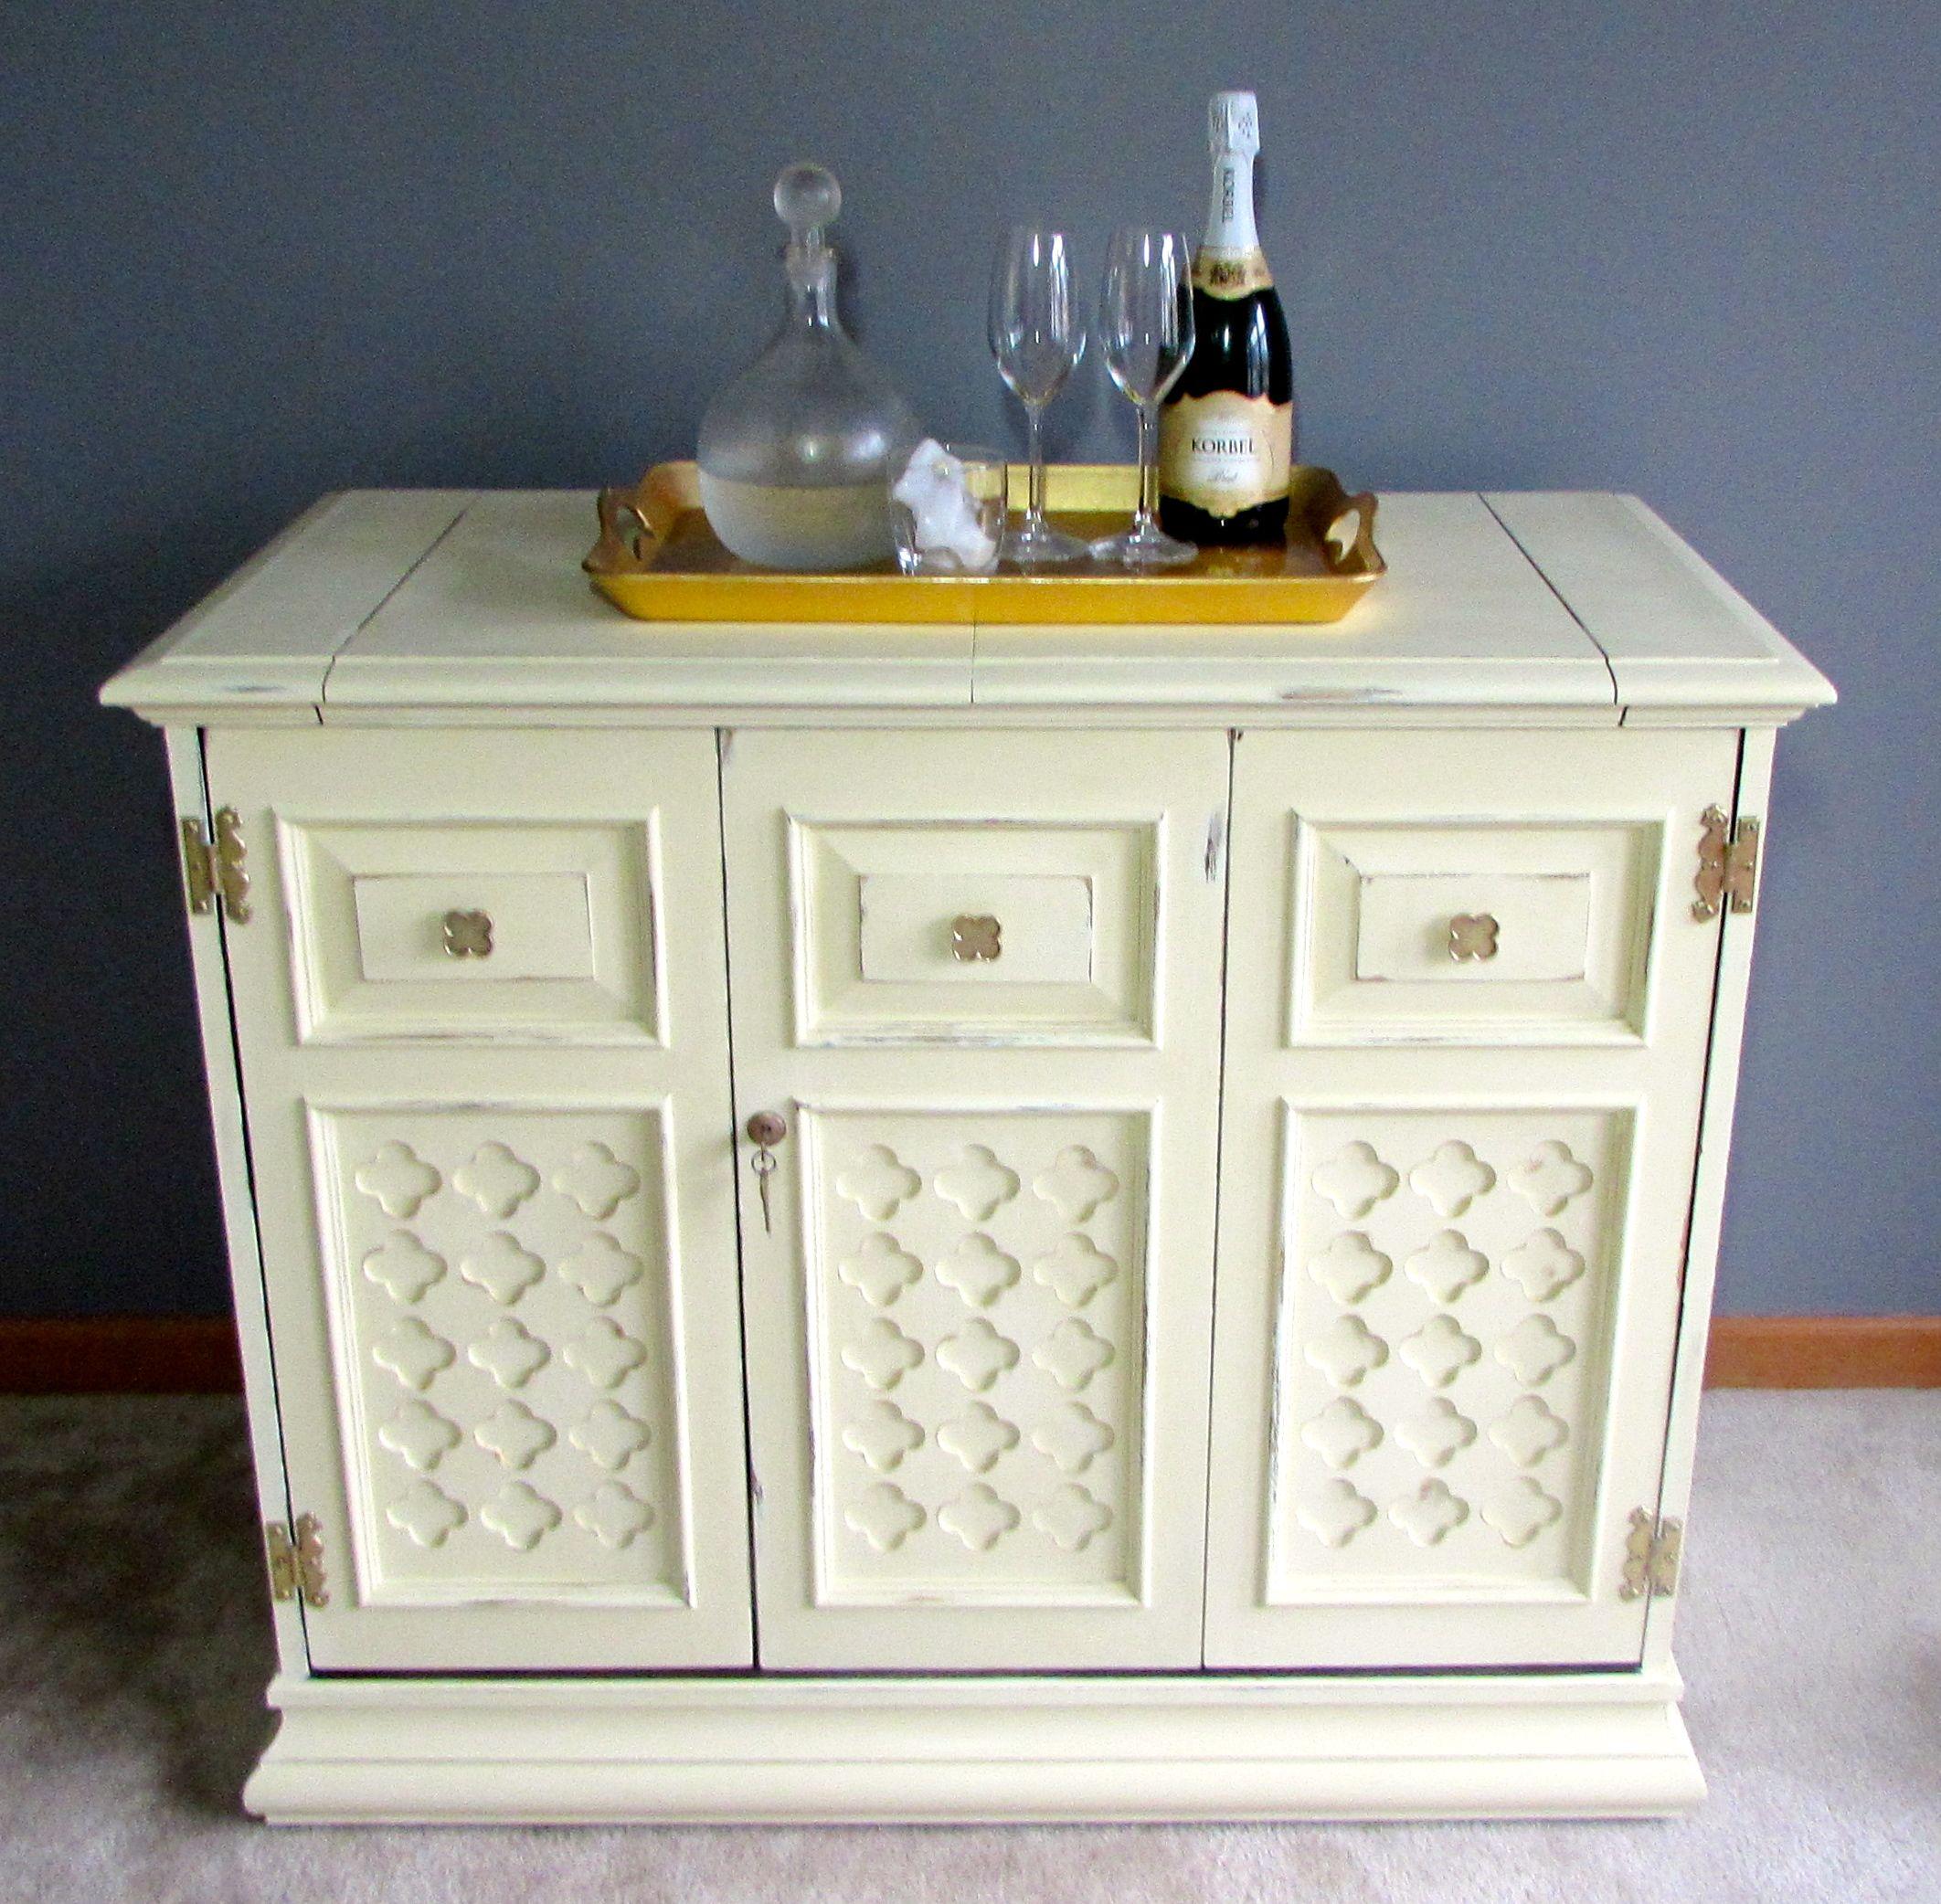 Jasper Cabinet Co. Vintage Bar Painted In Annie Sloan Cream. #anniesloan